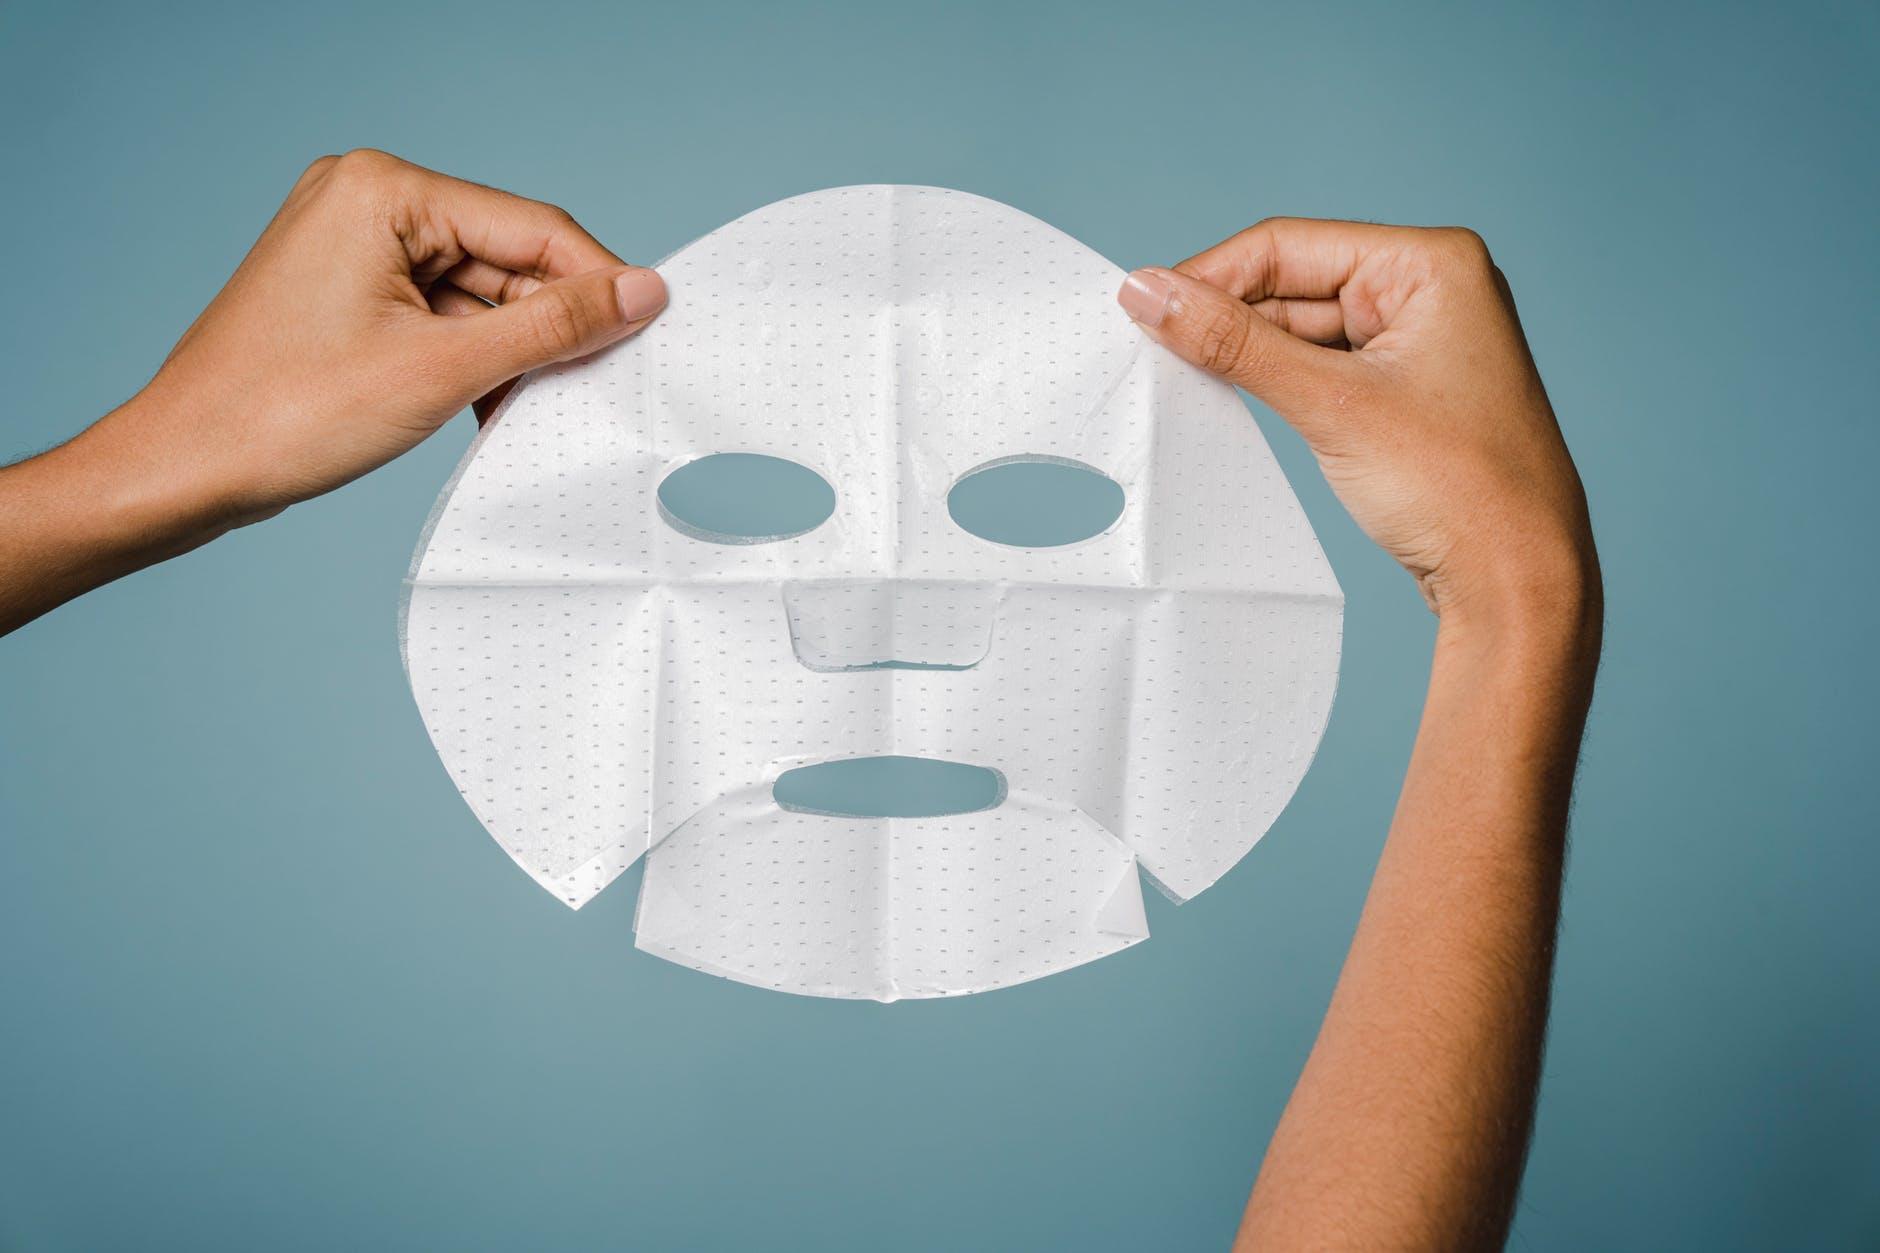 female showing sheet mask against blue background